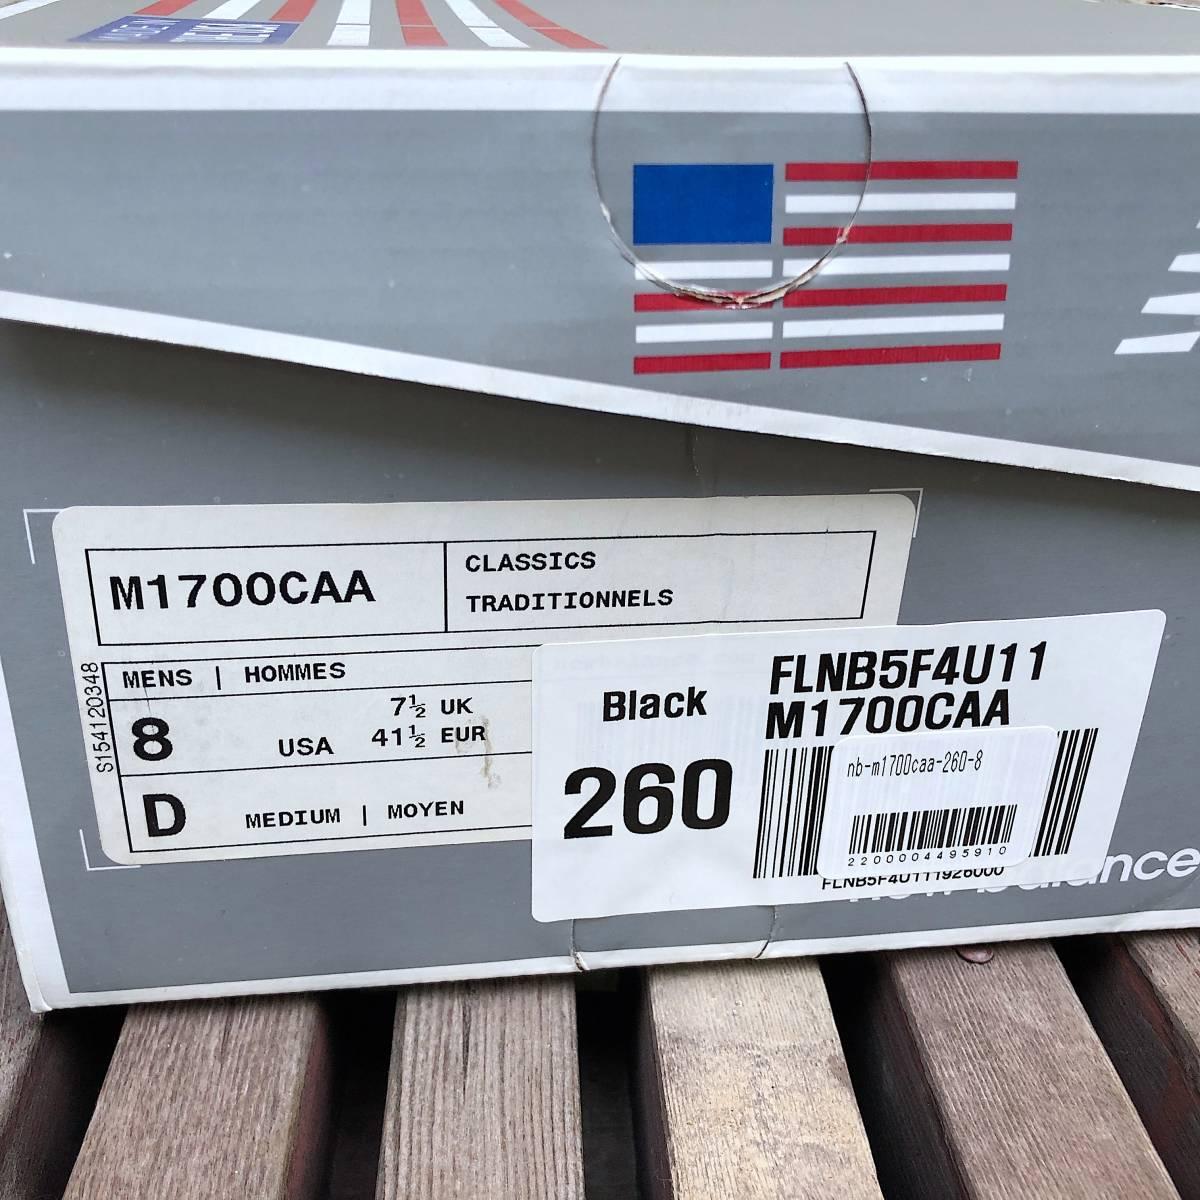 USA製 廃番 限定モデル NEW BALANCE M1700CAA BLACK×GRAY US8D 26cm 復刻 レザー 新品 アメリカ製 米国製 ブラック×グレー_画像9